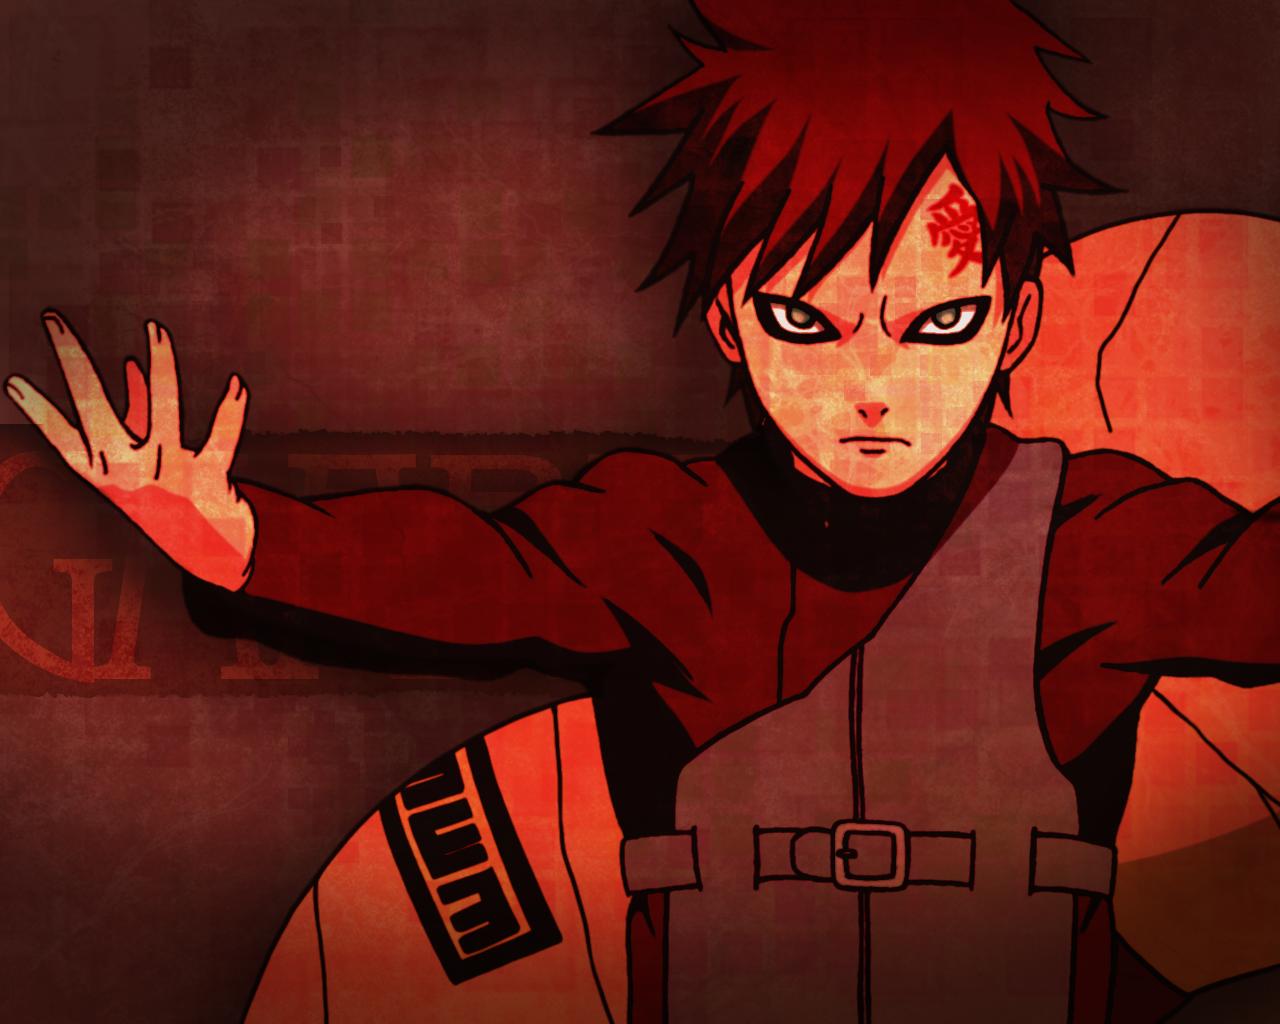 Gaara makes an ebil pose on this Naruto anime wallpaper 1280x1024